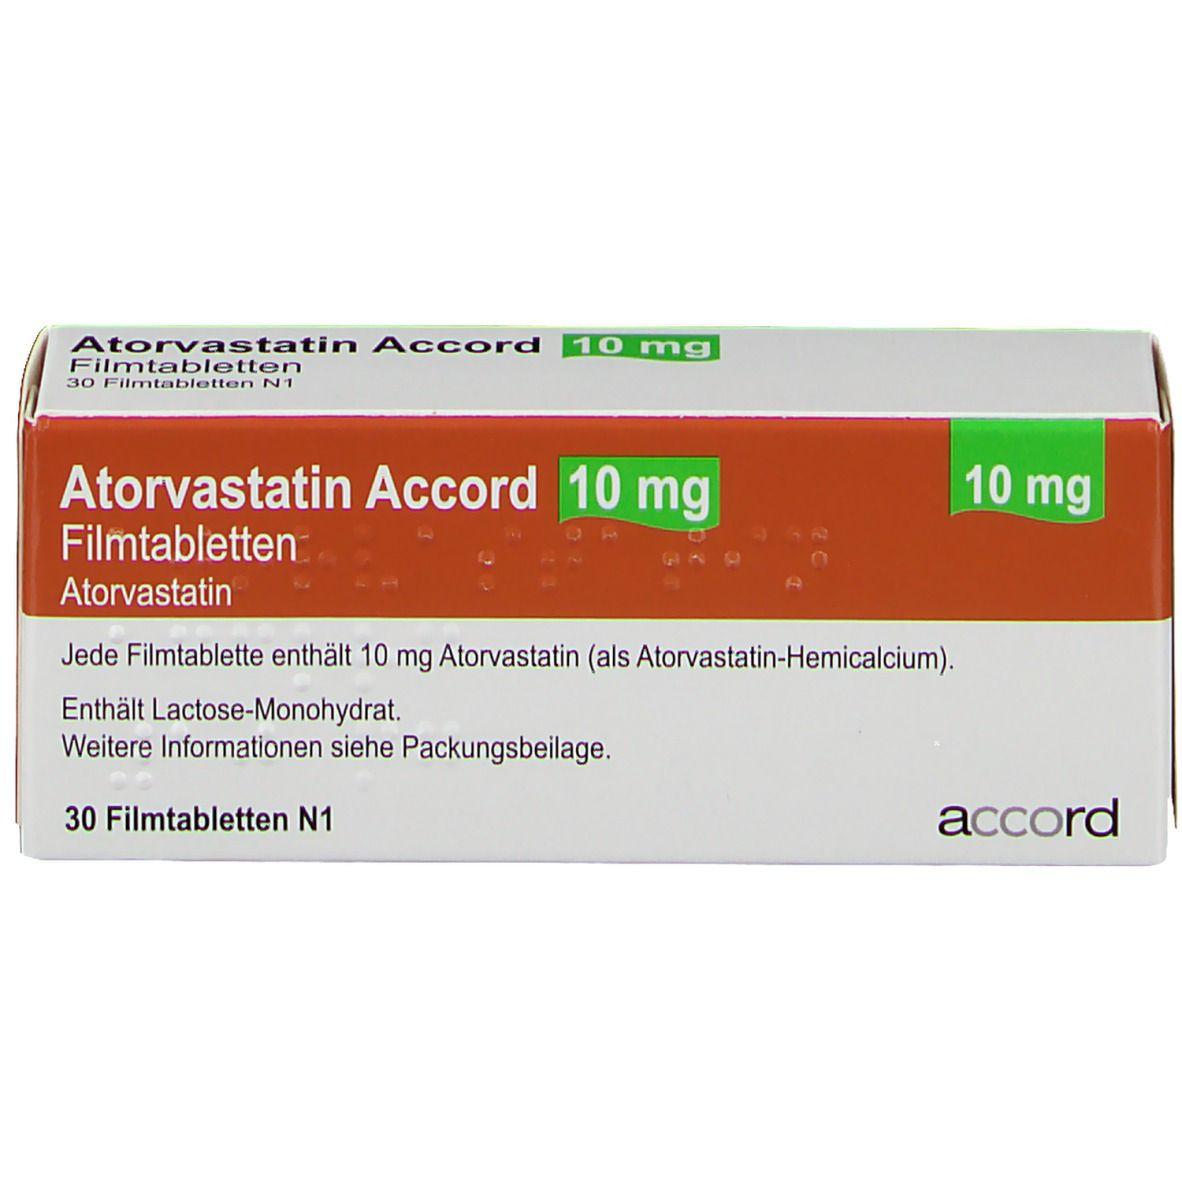 ATORVASTATIN Accord 10 mg Filmtabletten